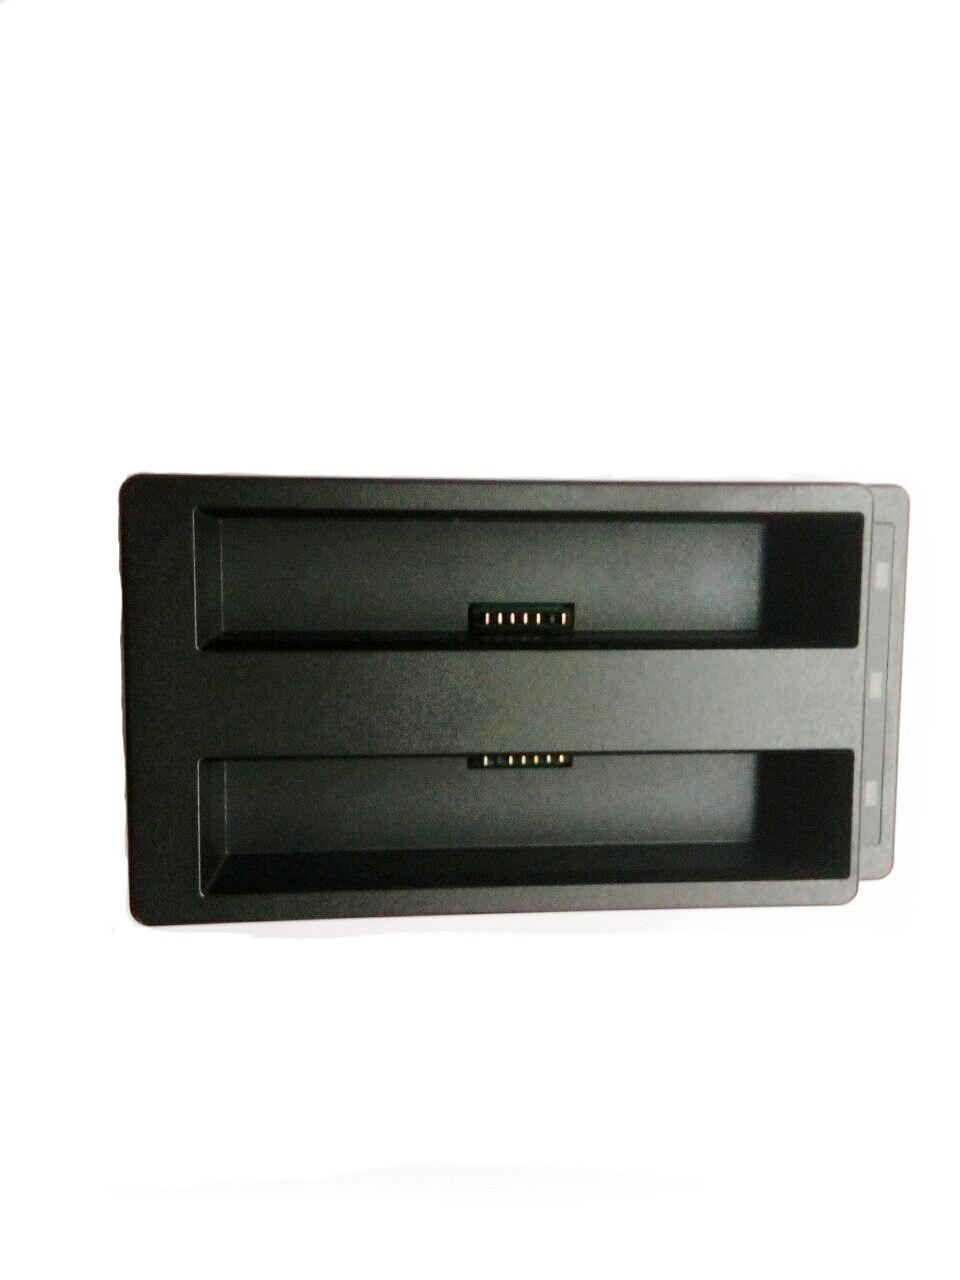 Original Fusion Splicer Battery Charger For Jilong KL 300S 500 510 520 530 C3 Fiber Optical